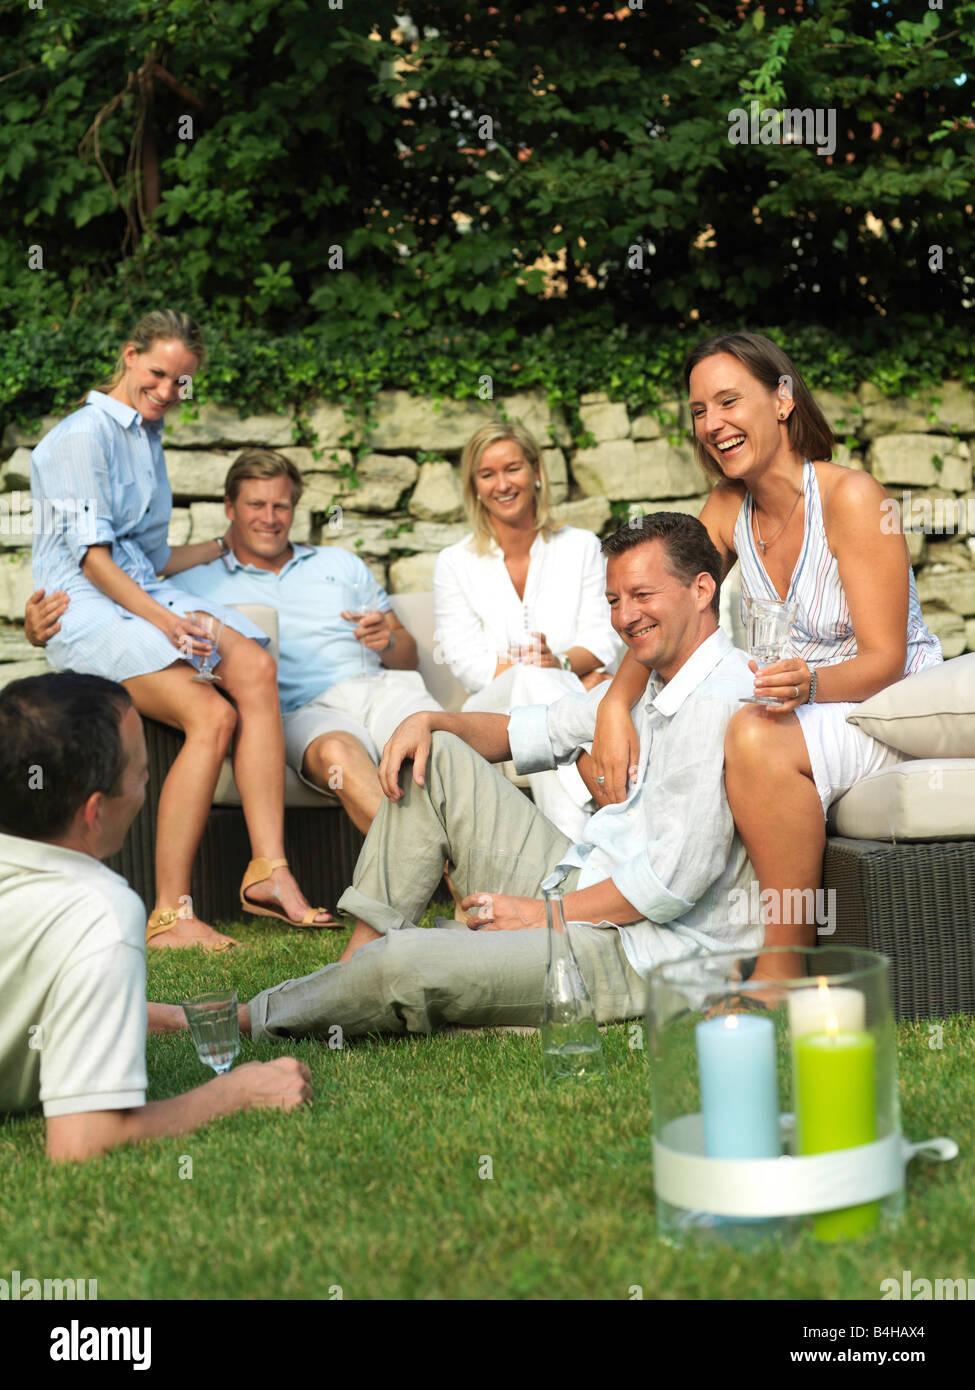 Three couples celebrating garden party - Stock Image